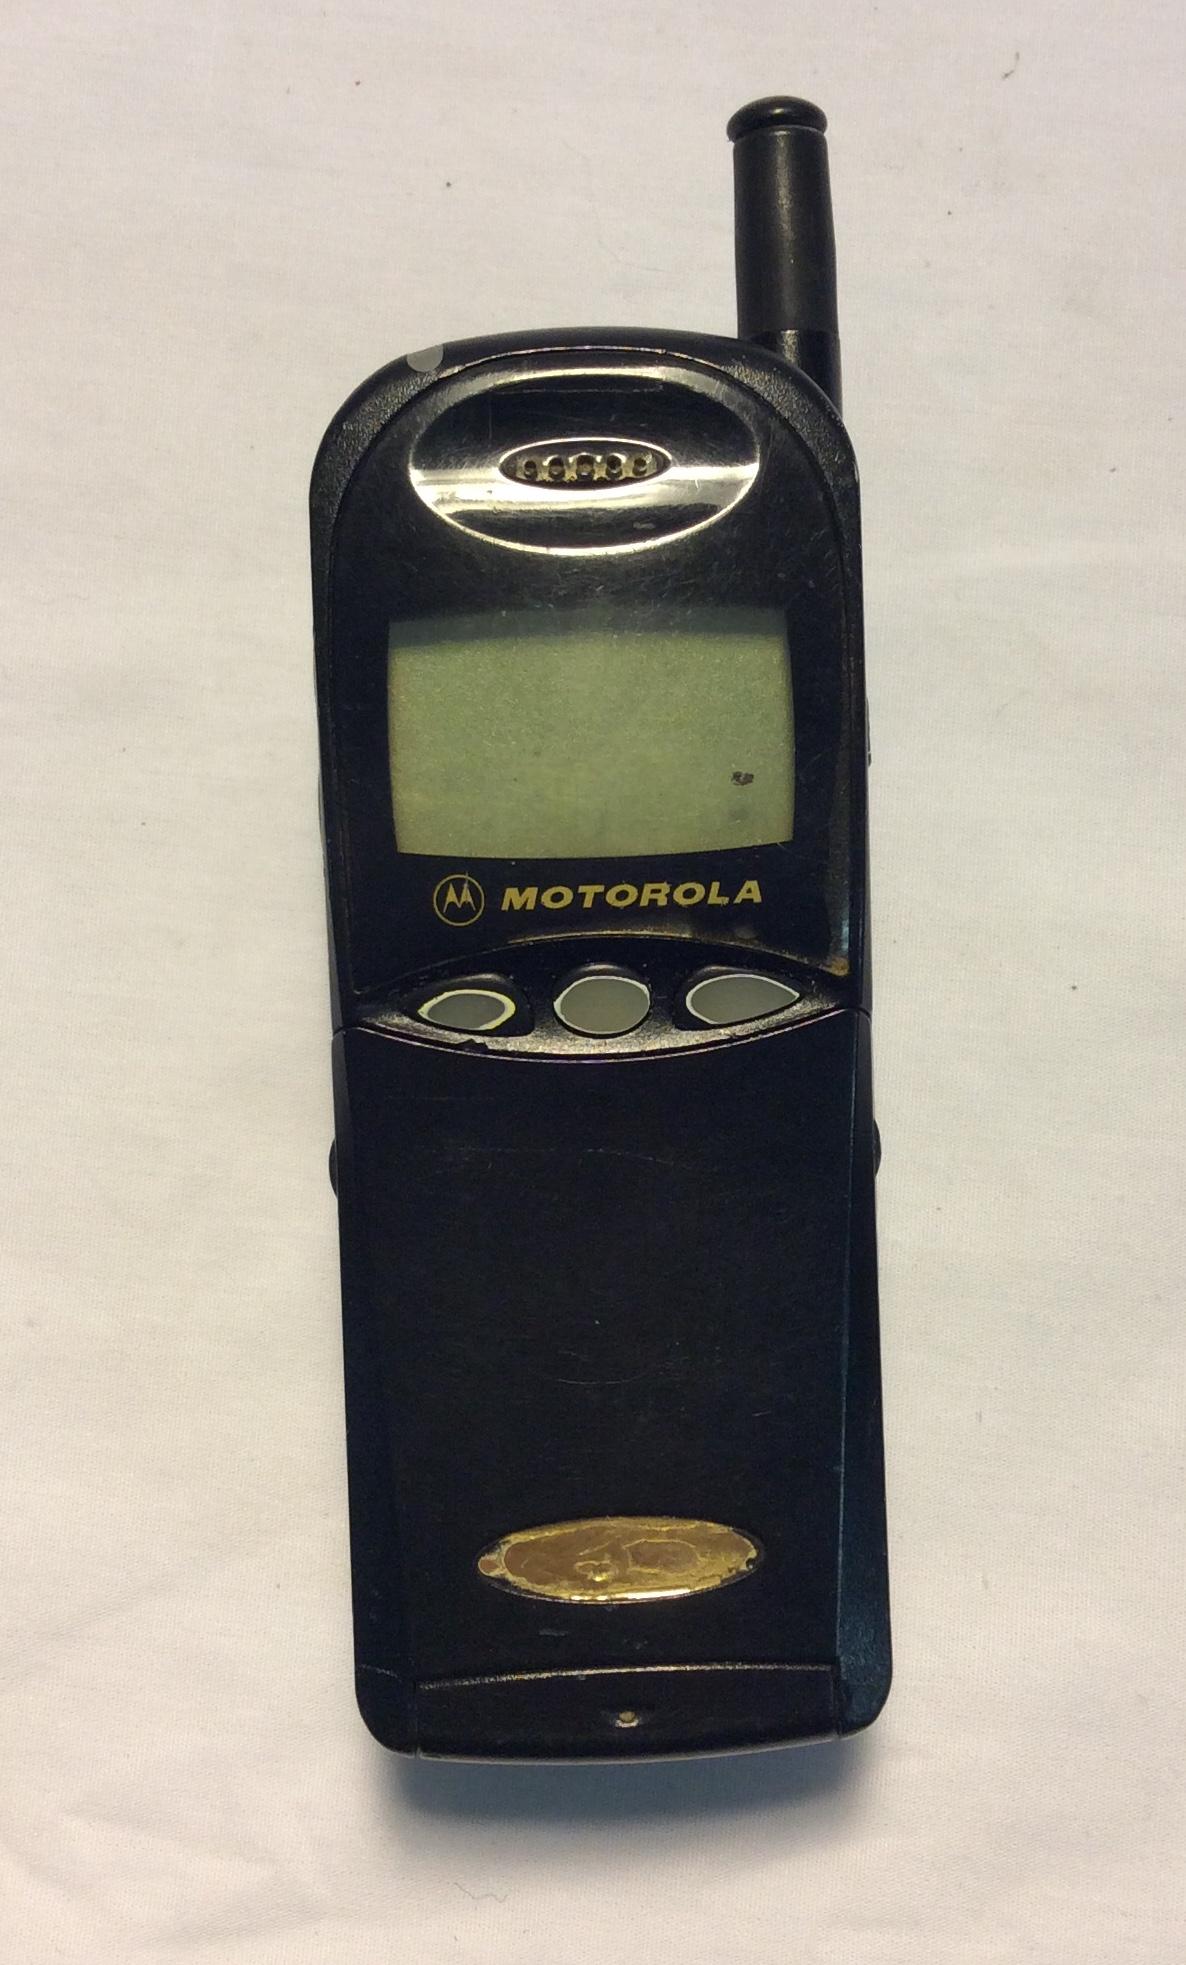 MOTOROLA Cellphone